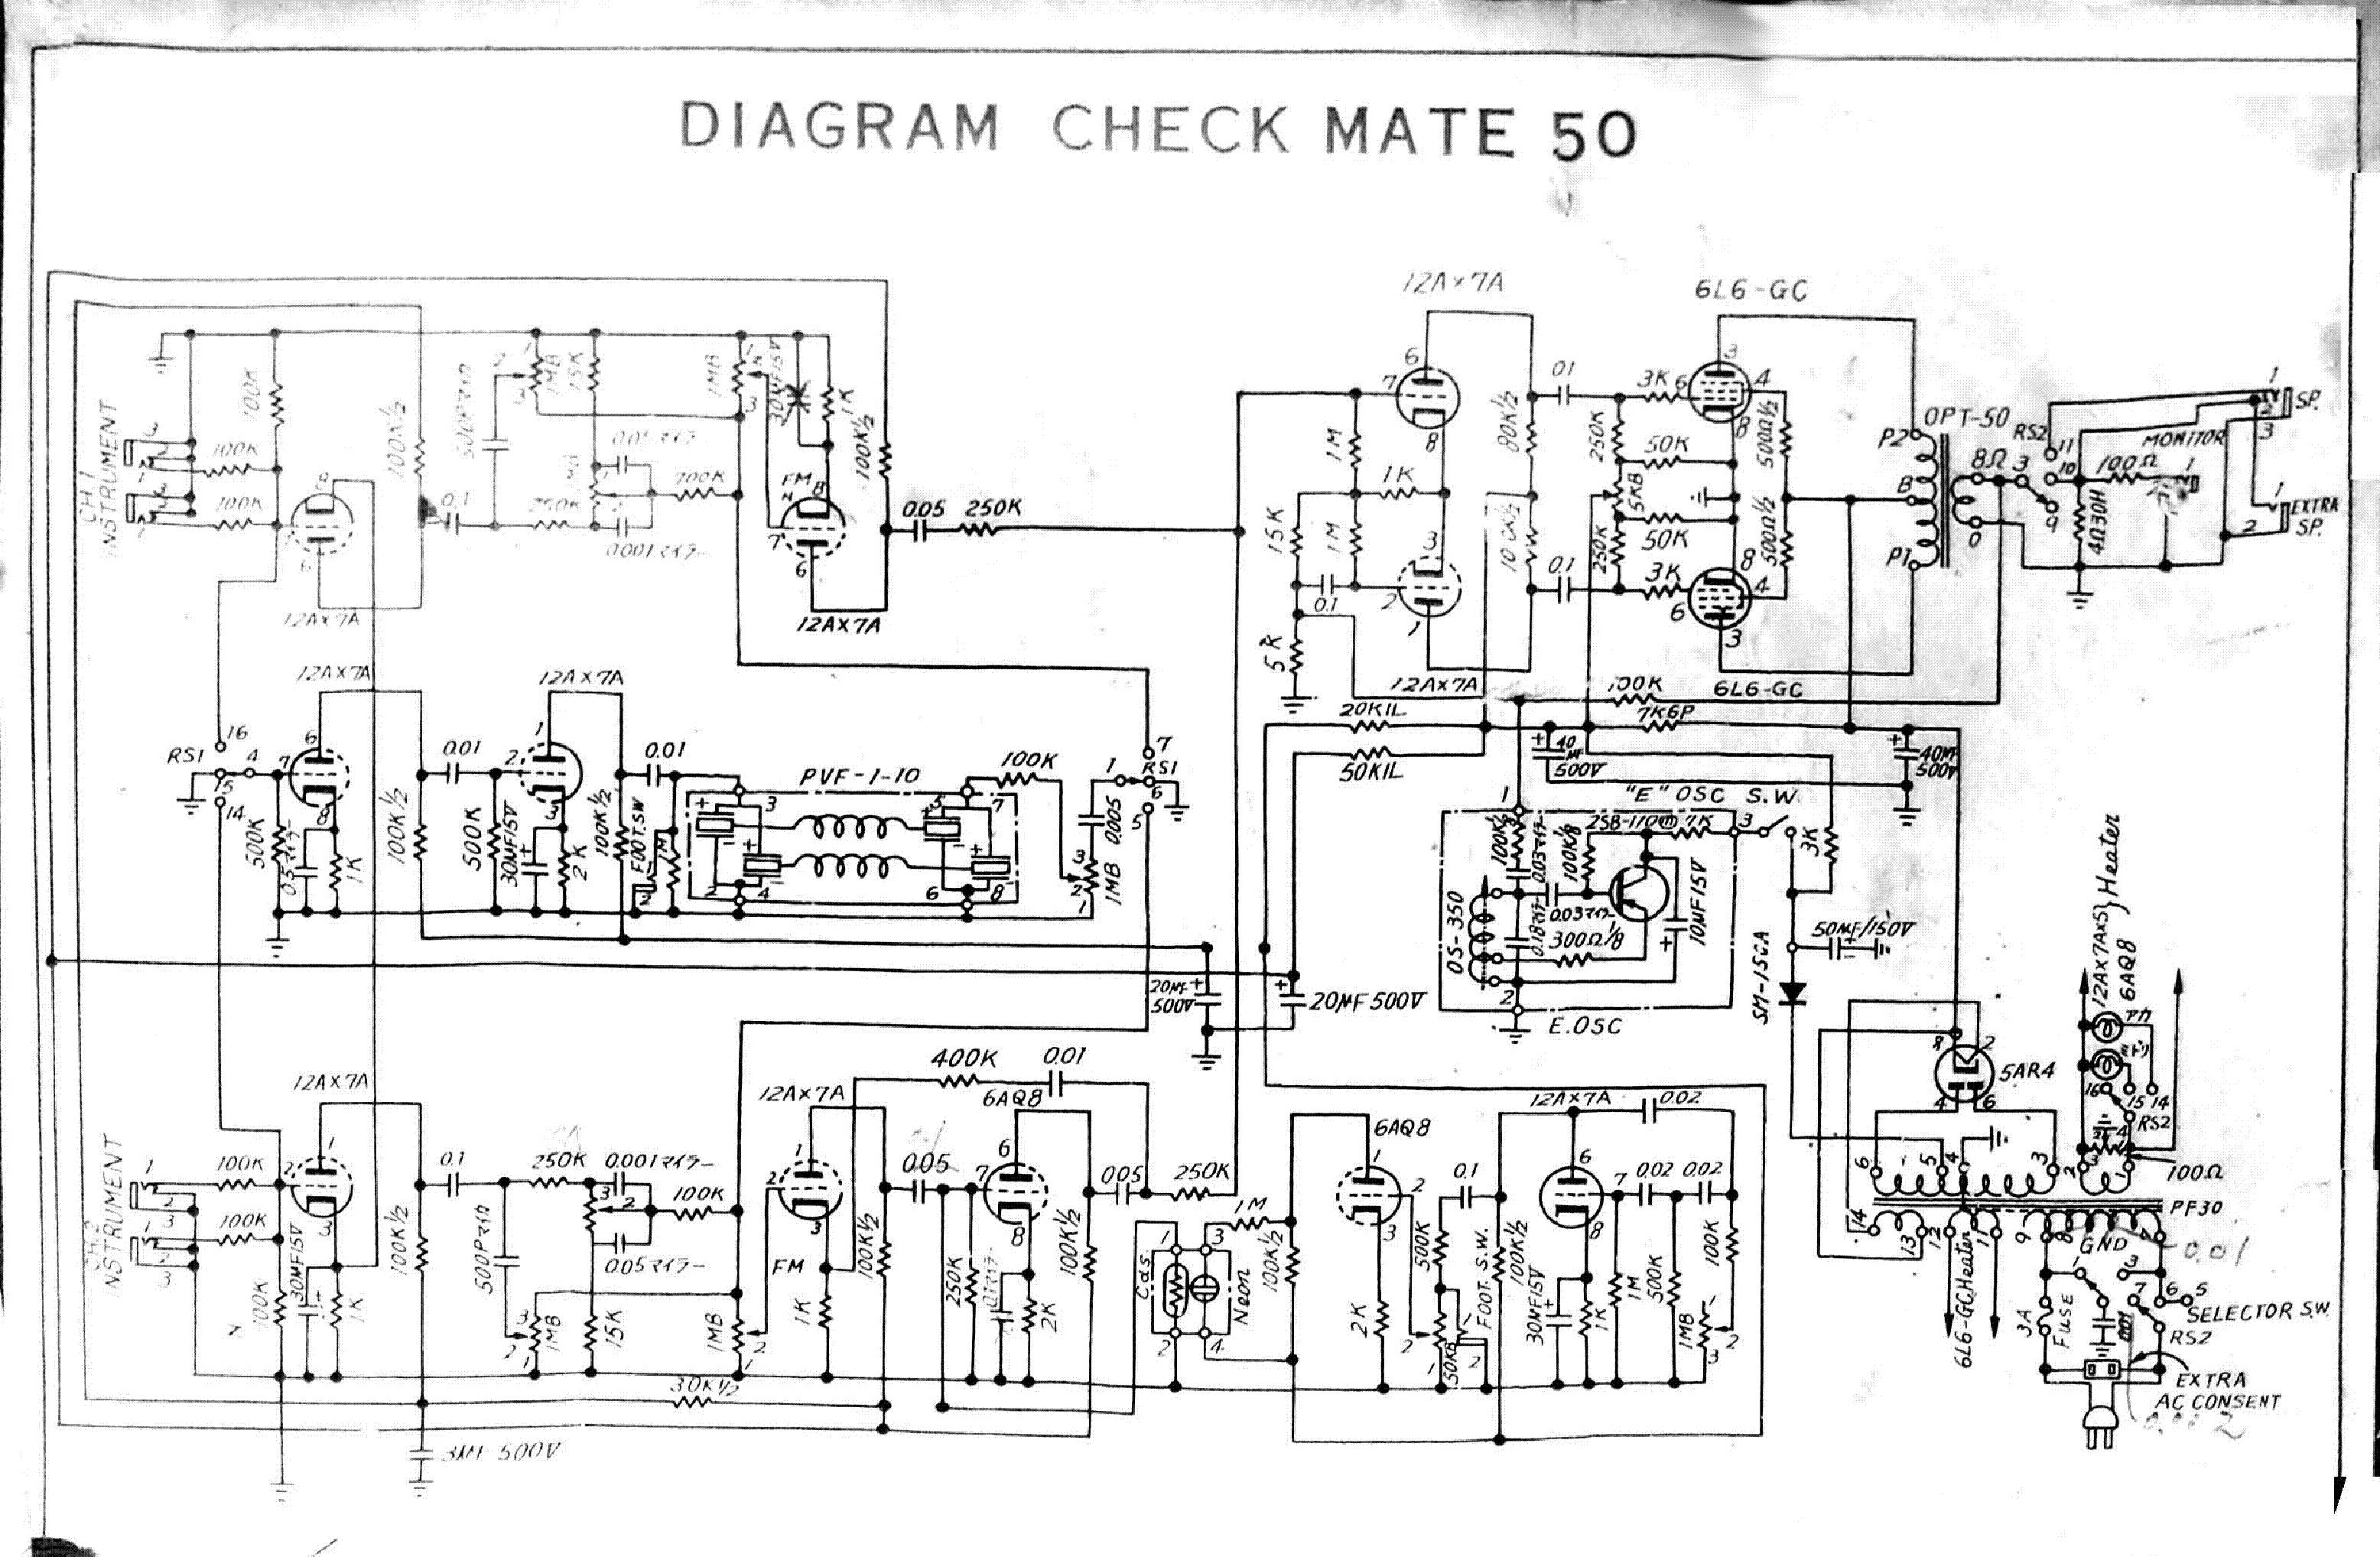 Schemat, obrazek: Firmowe/TEISCO-Japan/TEISCO_CHECKMATE_50.png